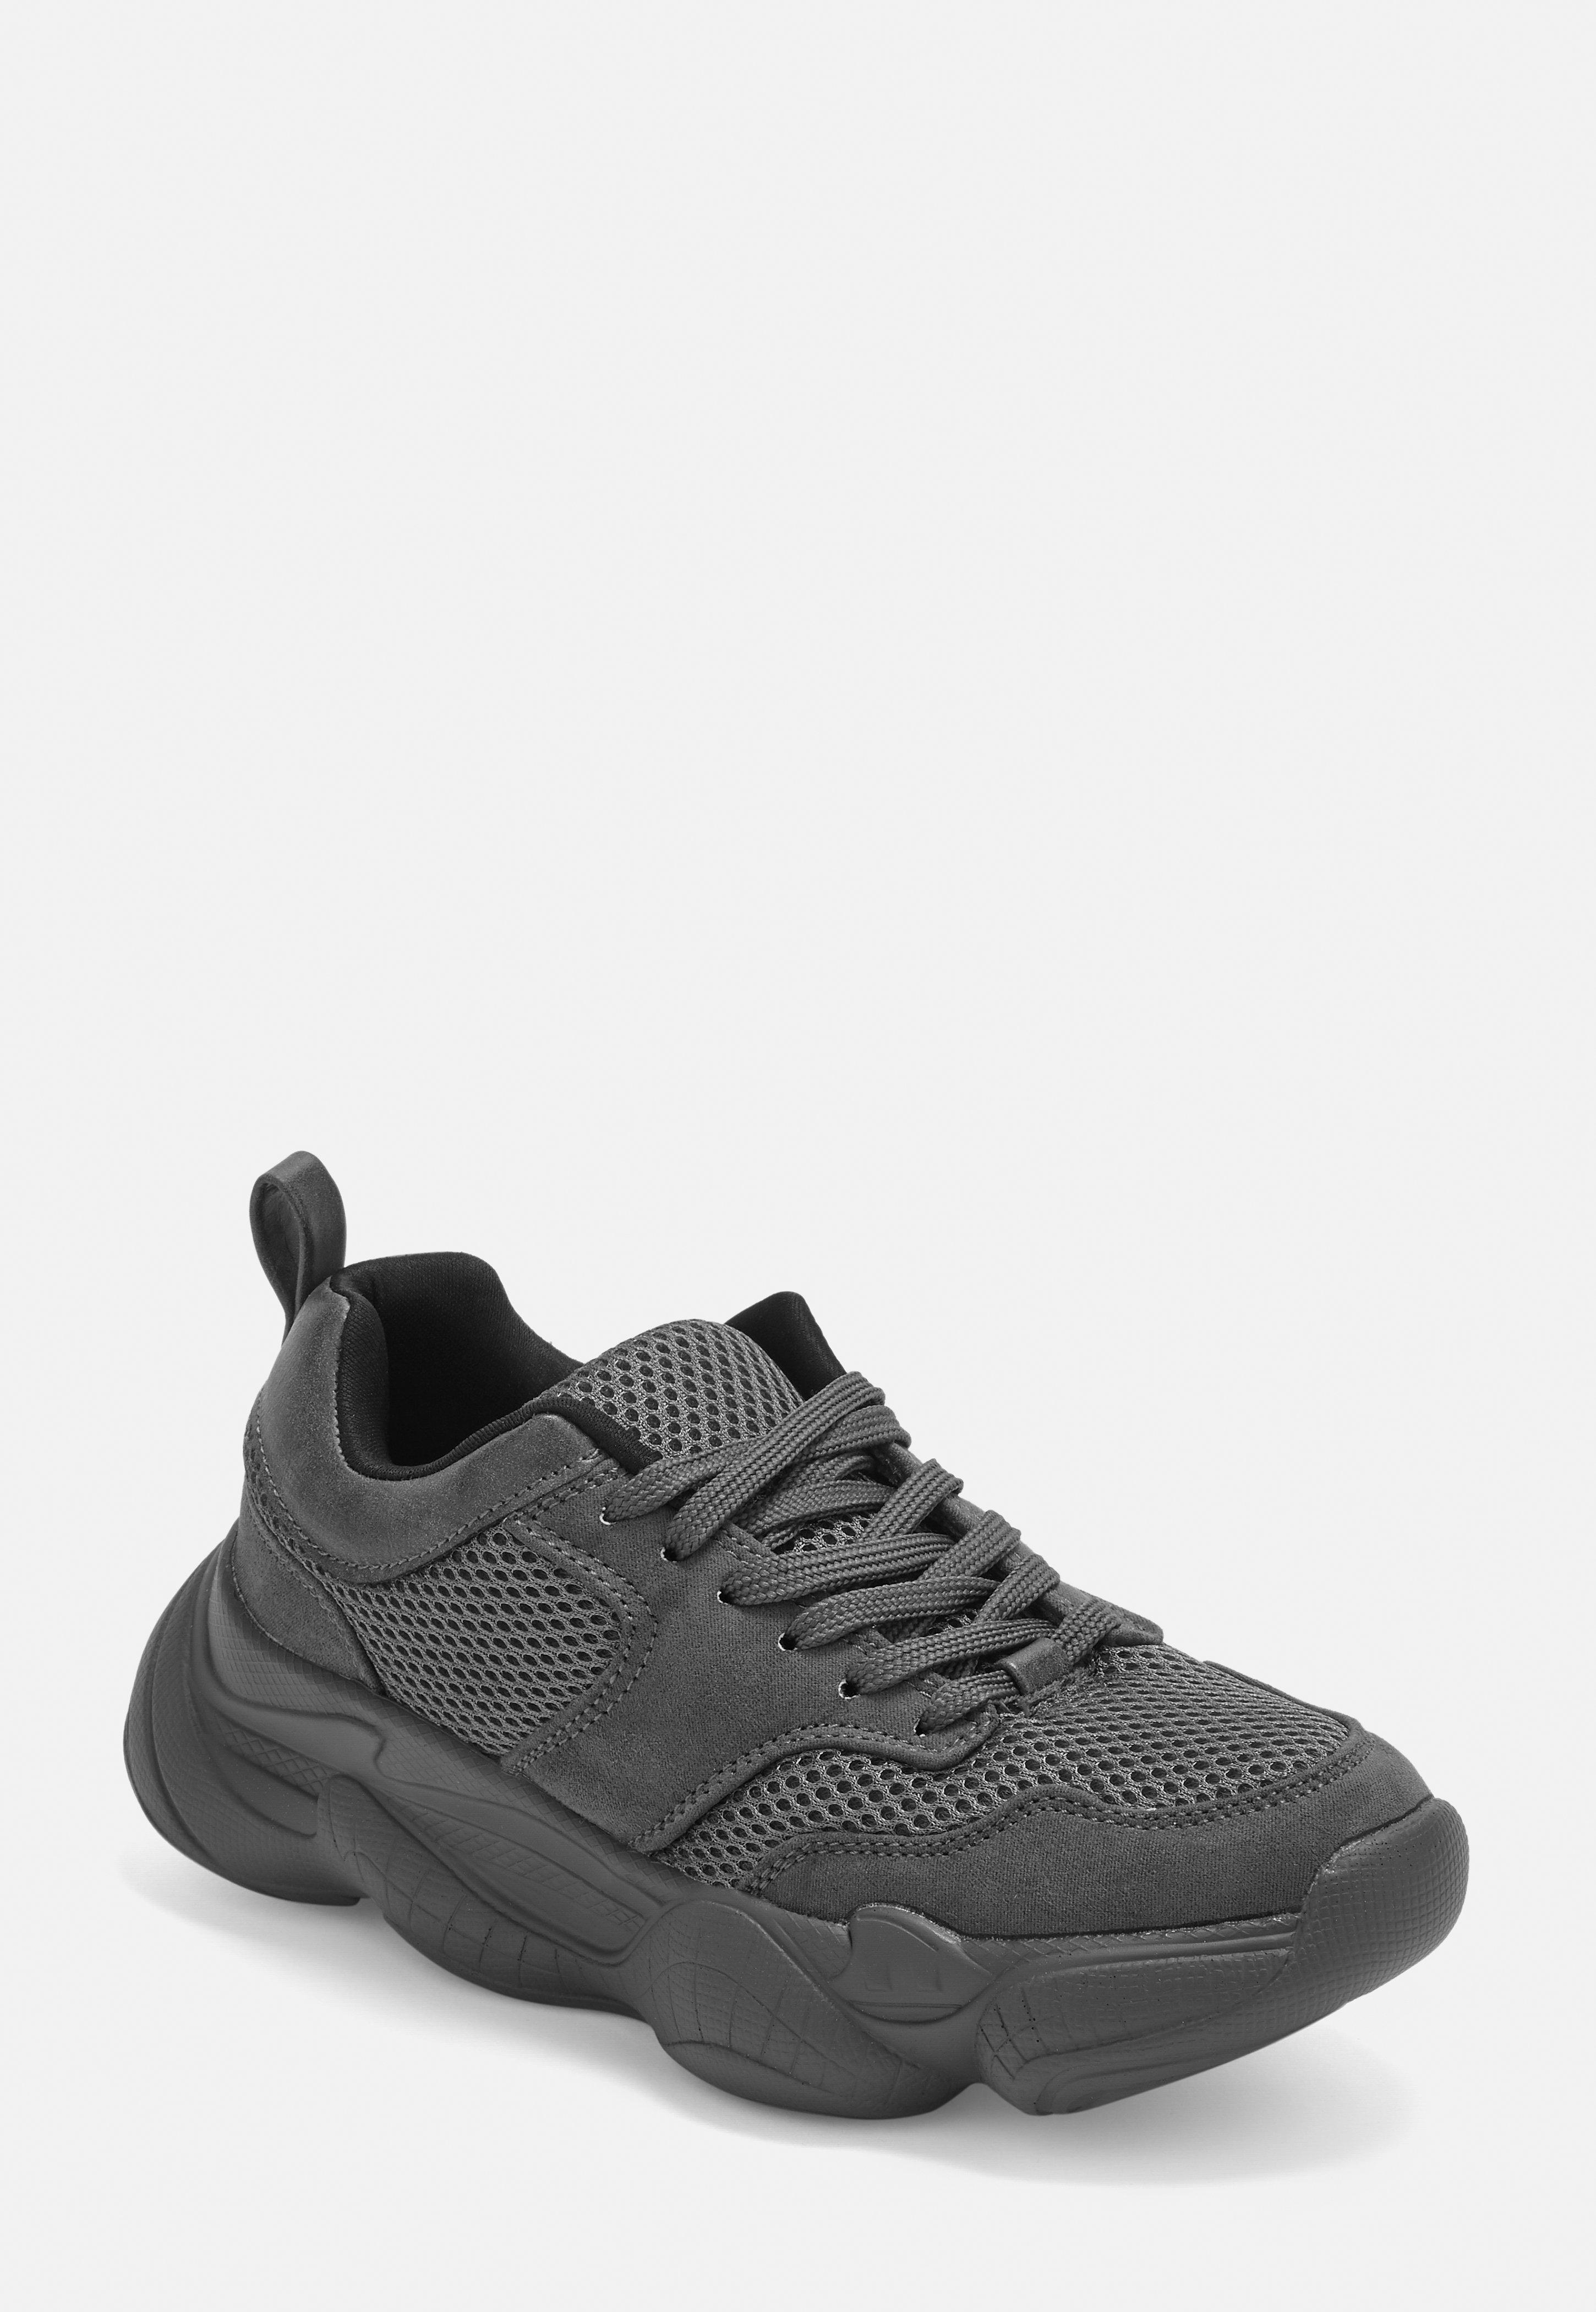 4b9be7bdb61 Sneakers - Shop Women s Sneakers Online